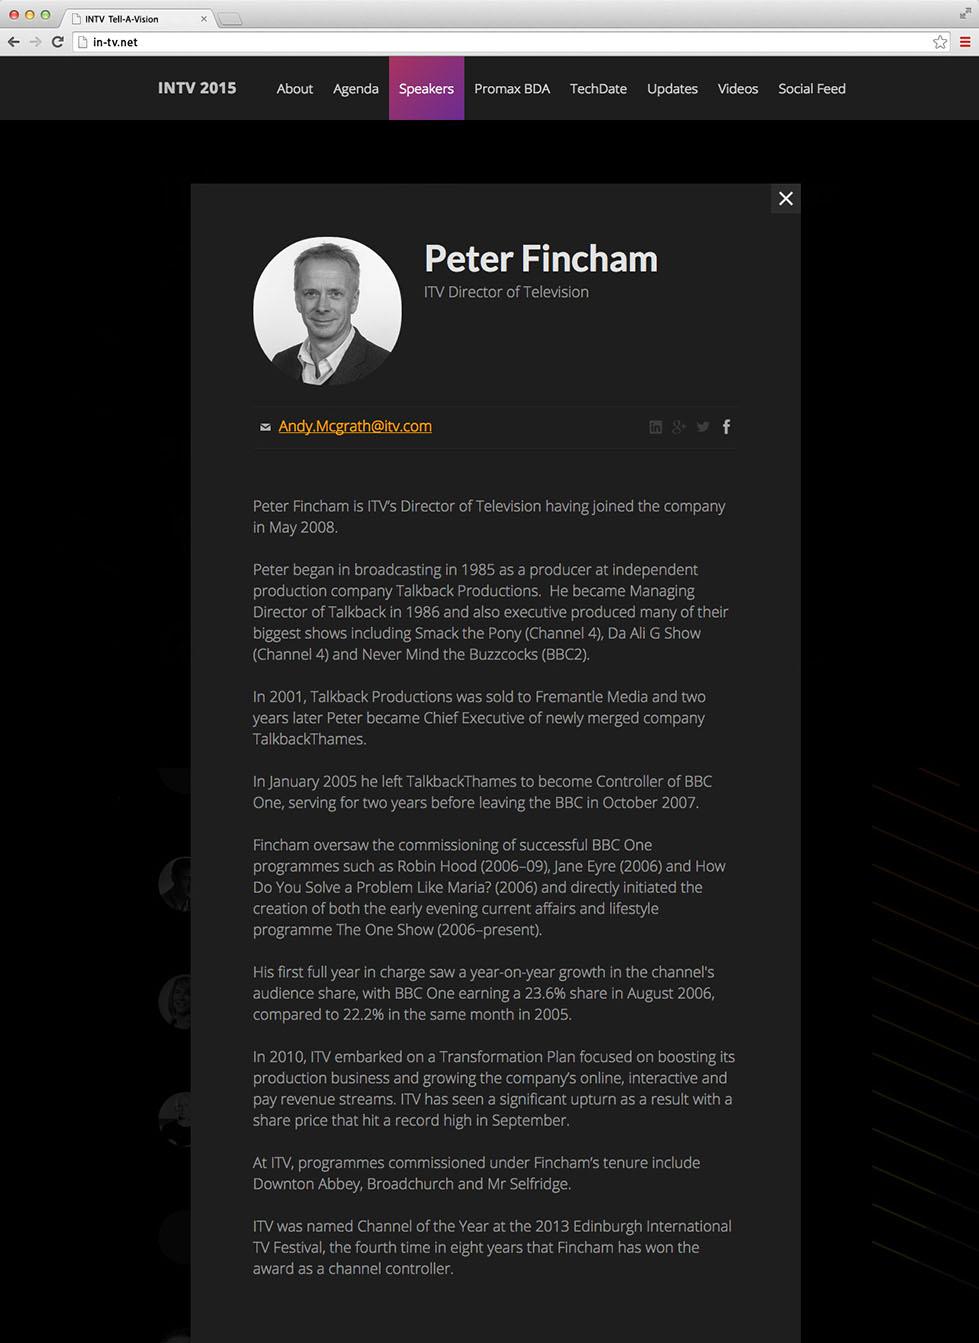 Speaker page on the desktop site, INTV conference